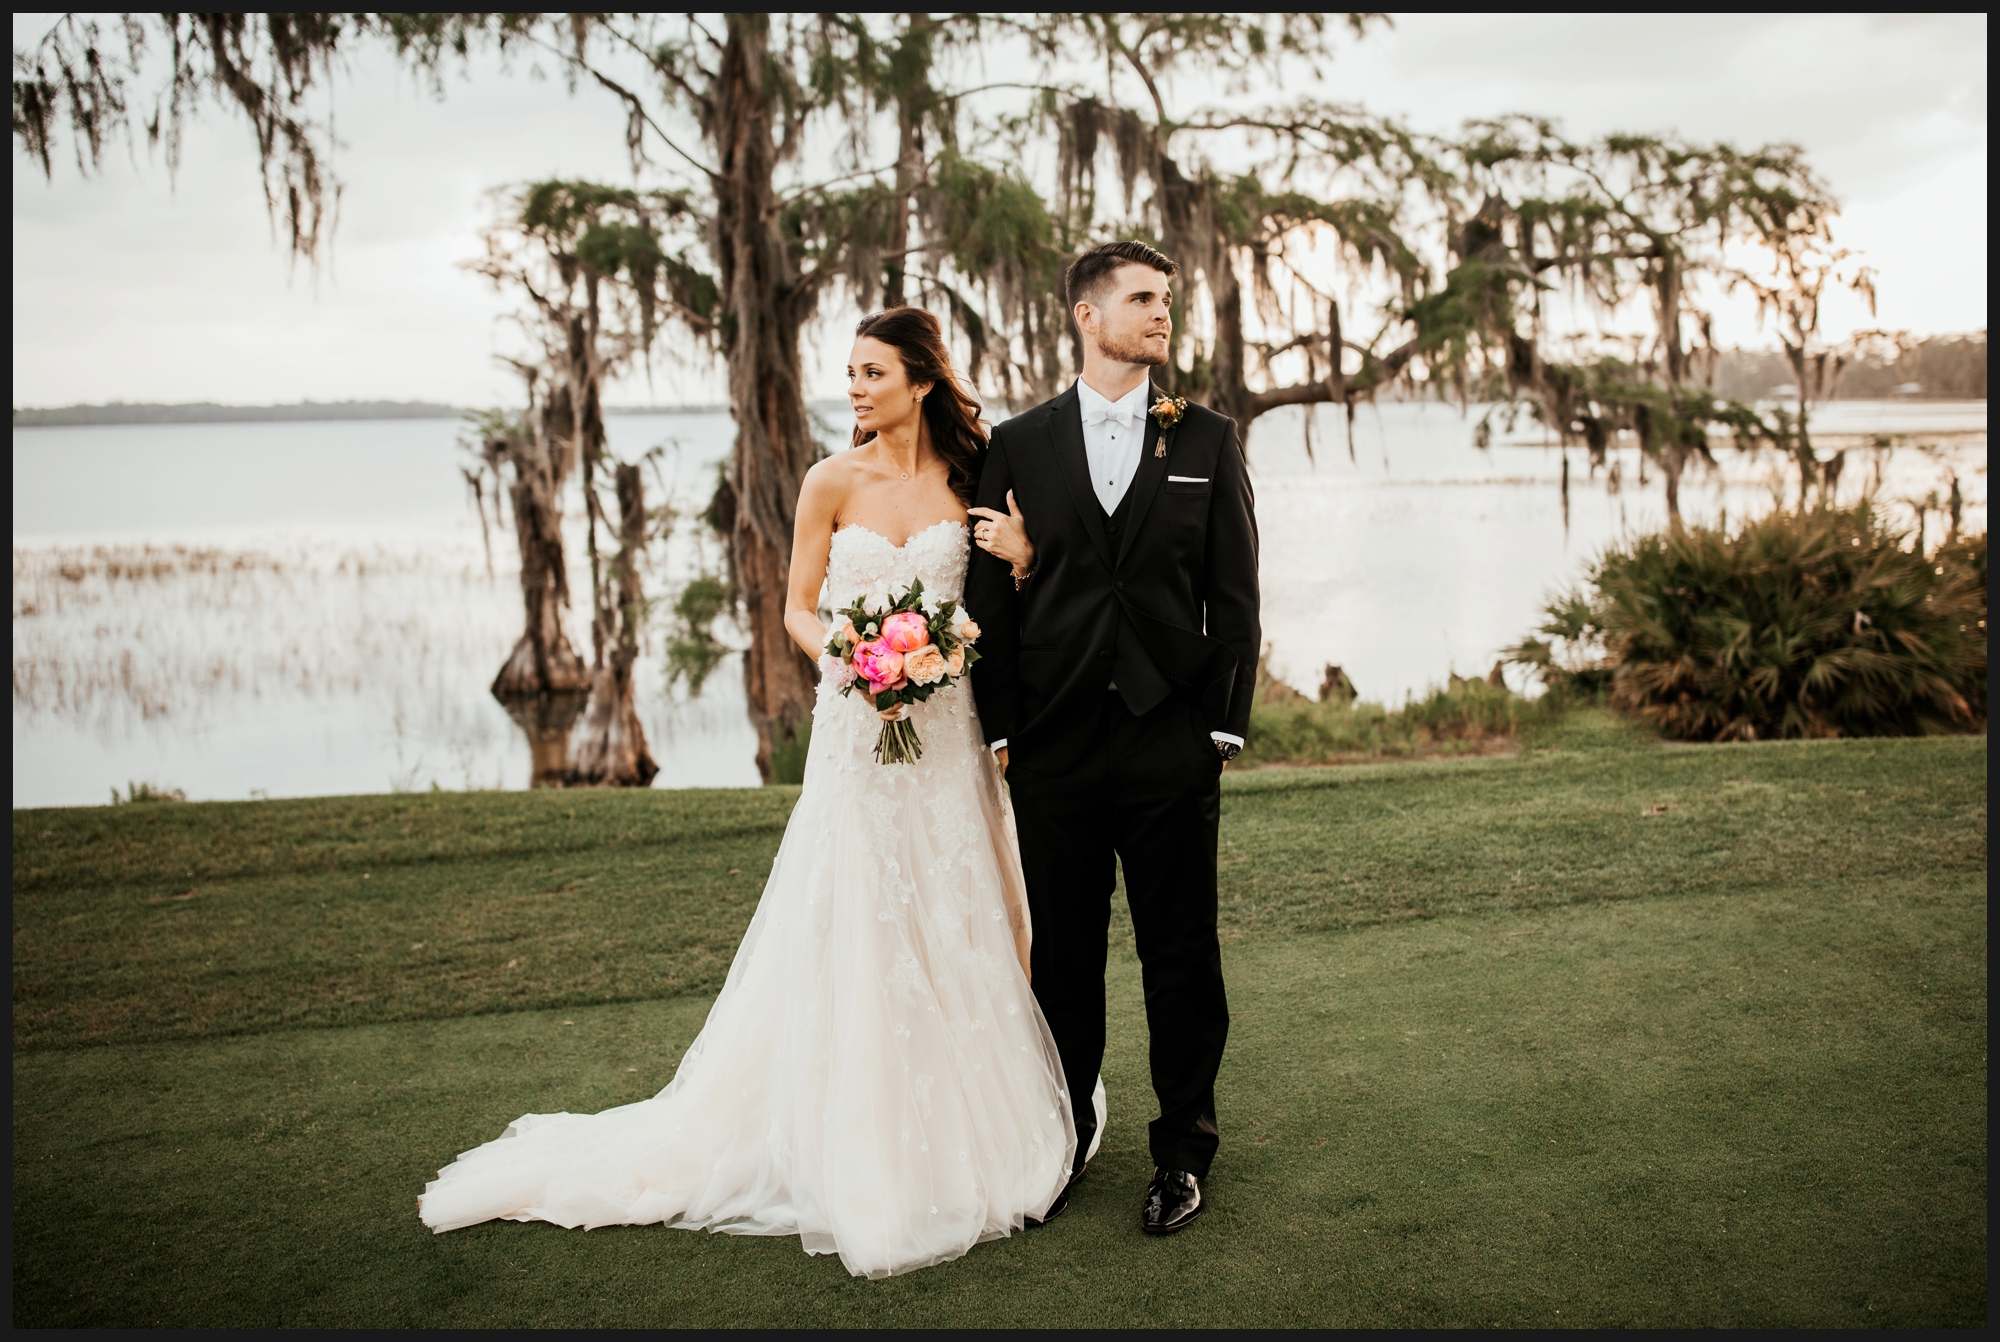 Orlando-Wedding-Photographer-destination-wedding-photographer-florida-wedding-photographer-hawaii-wedding-photographer_0184.jpg